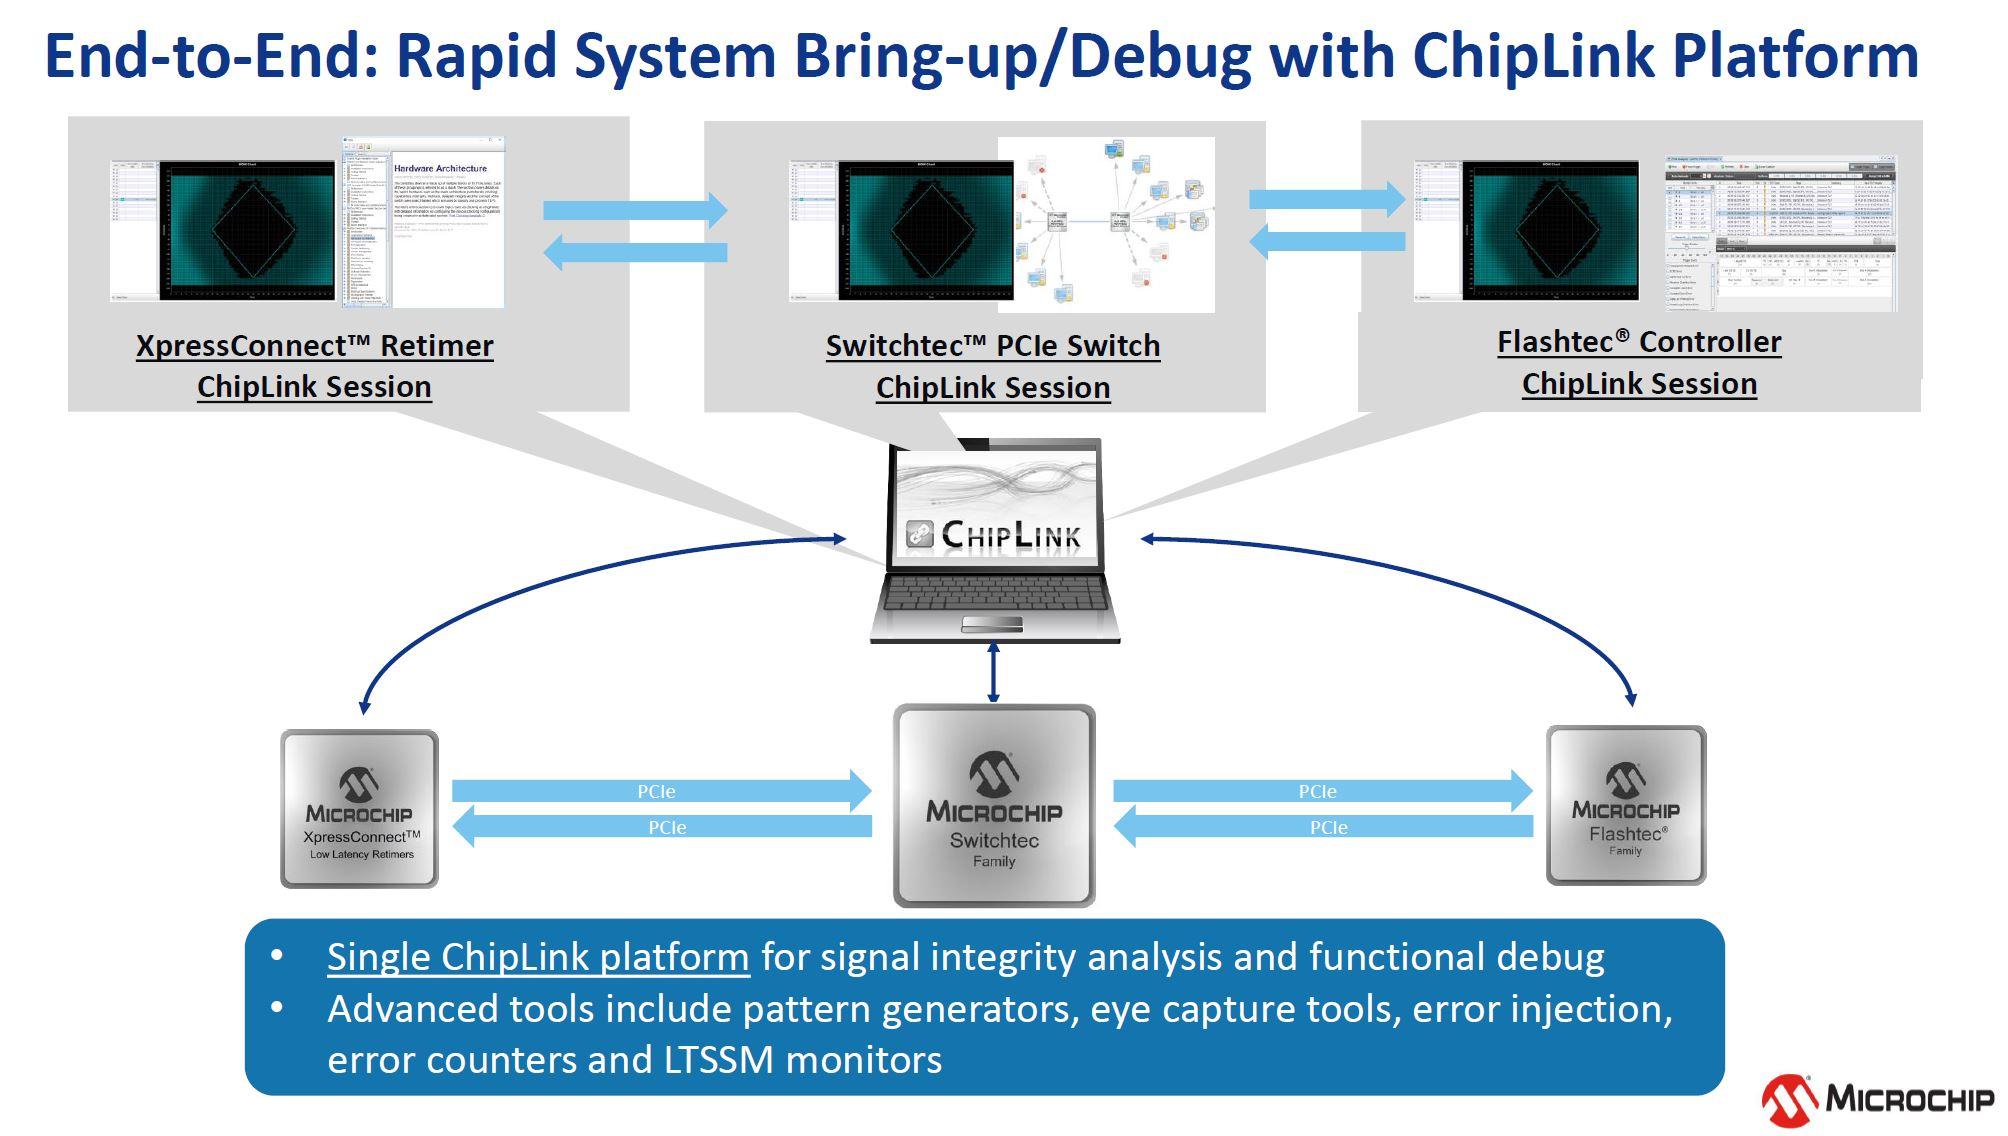 Microchip Switchtec PCIe 5.0 Switch ChipLink